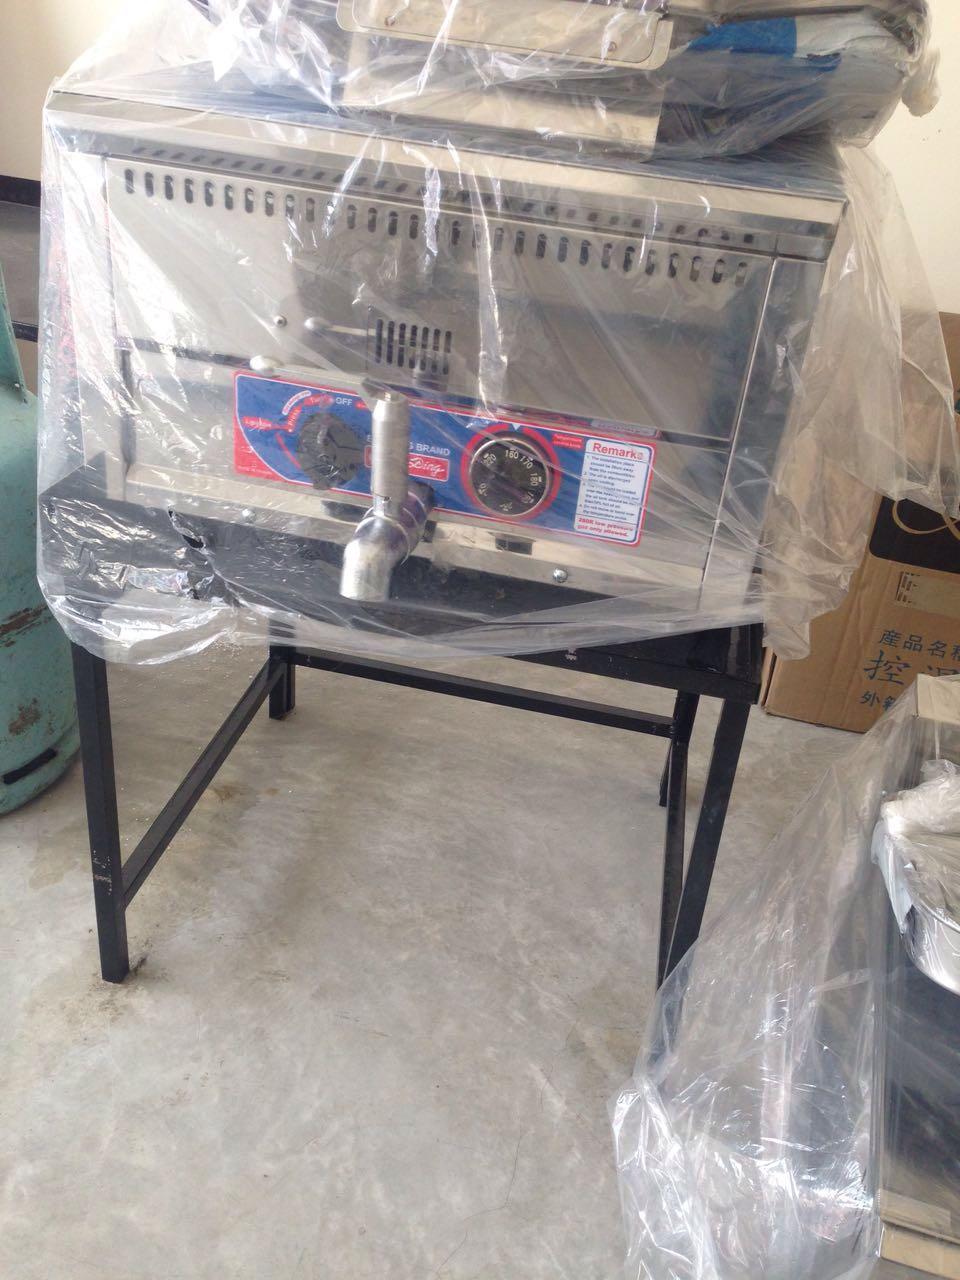 1 Gunting Lidi A 1termometer Kepala Gas Kotak Polister 3 Papan Tanda Polycarbonate Hot Fried En Sarung Tangan Plastik